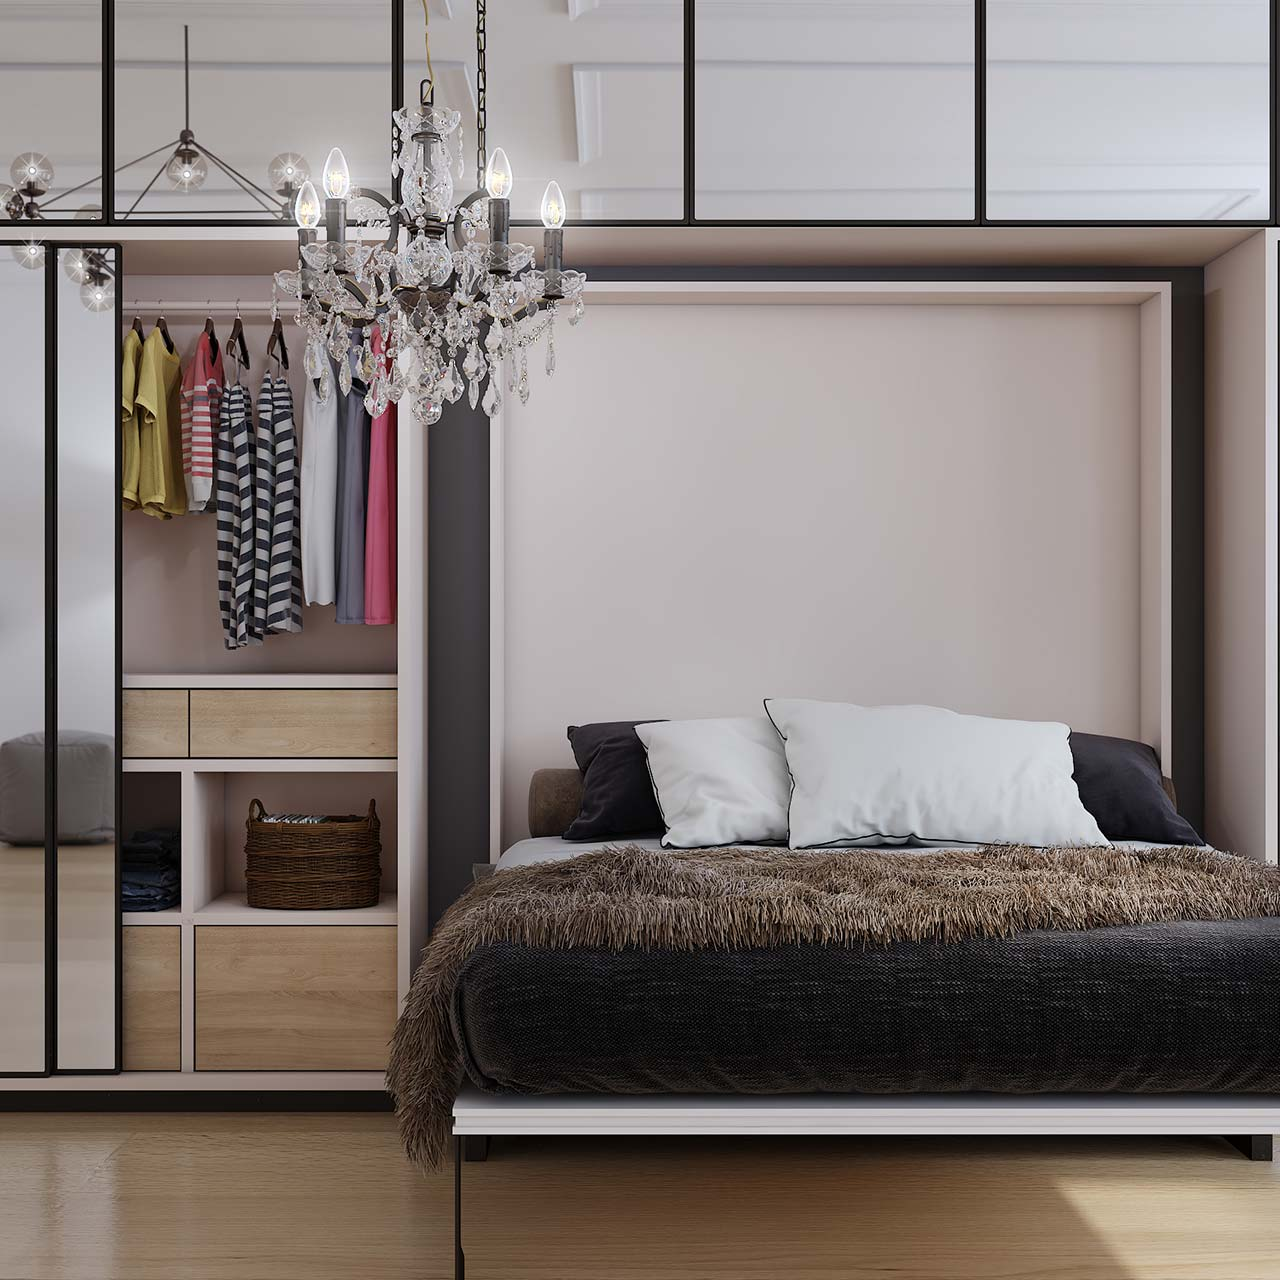 Pick an Anchor Item for Master Bedroom Design